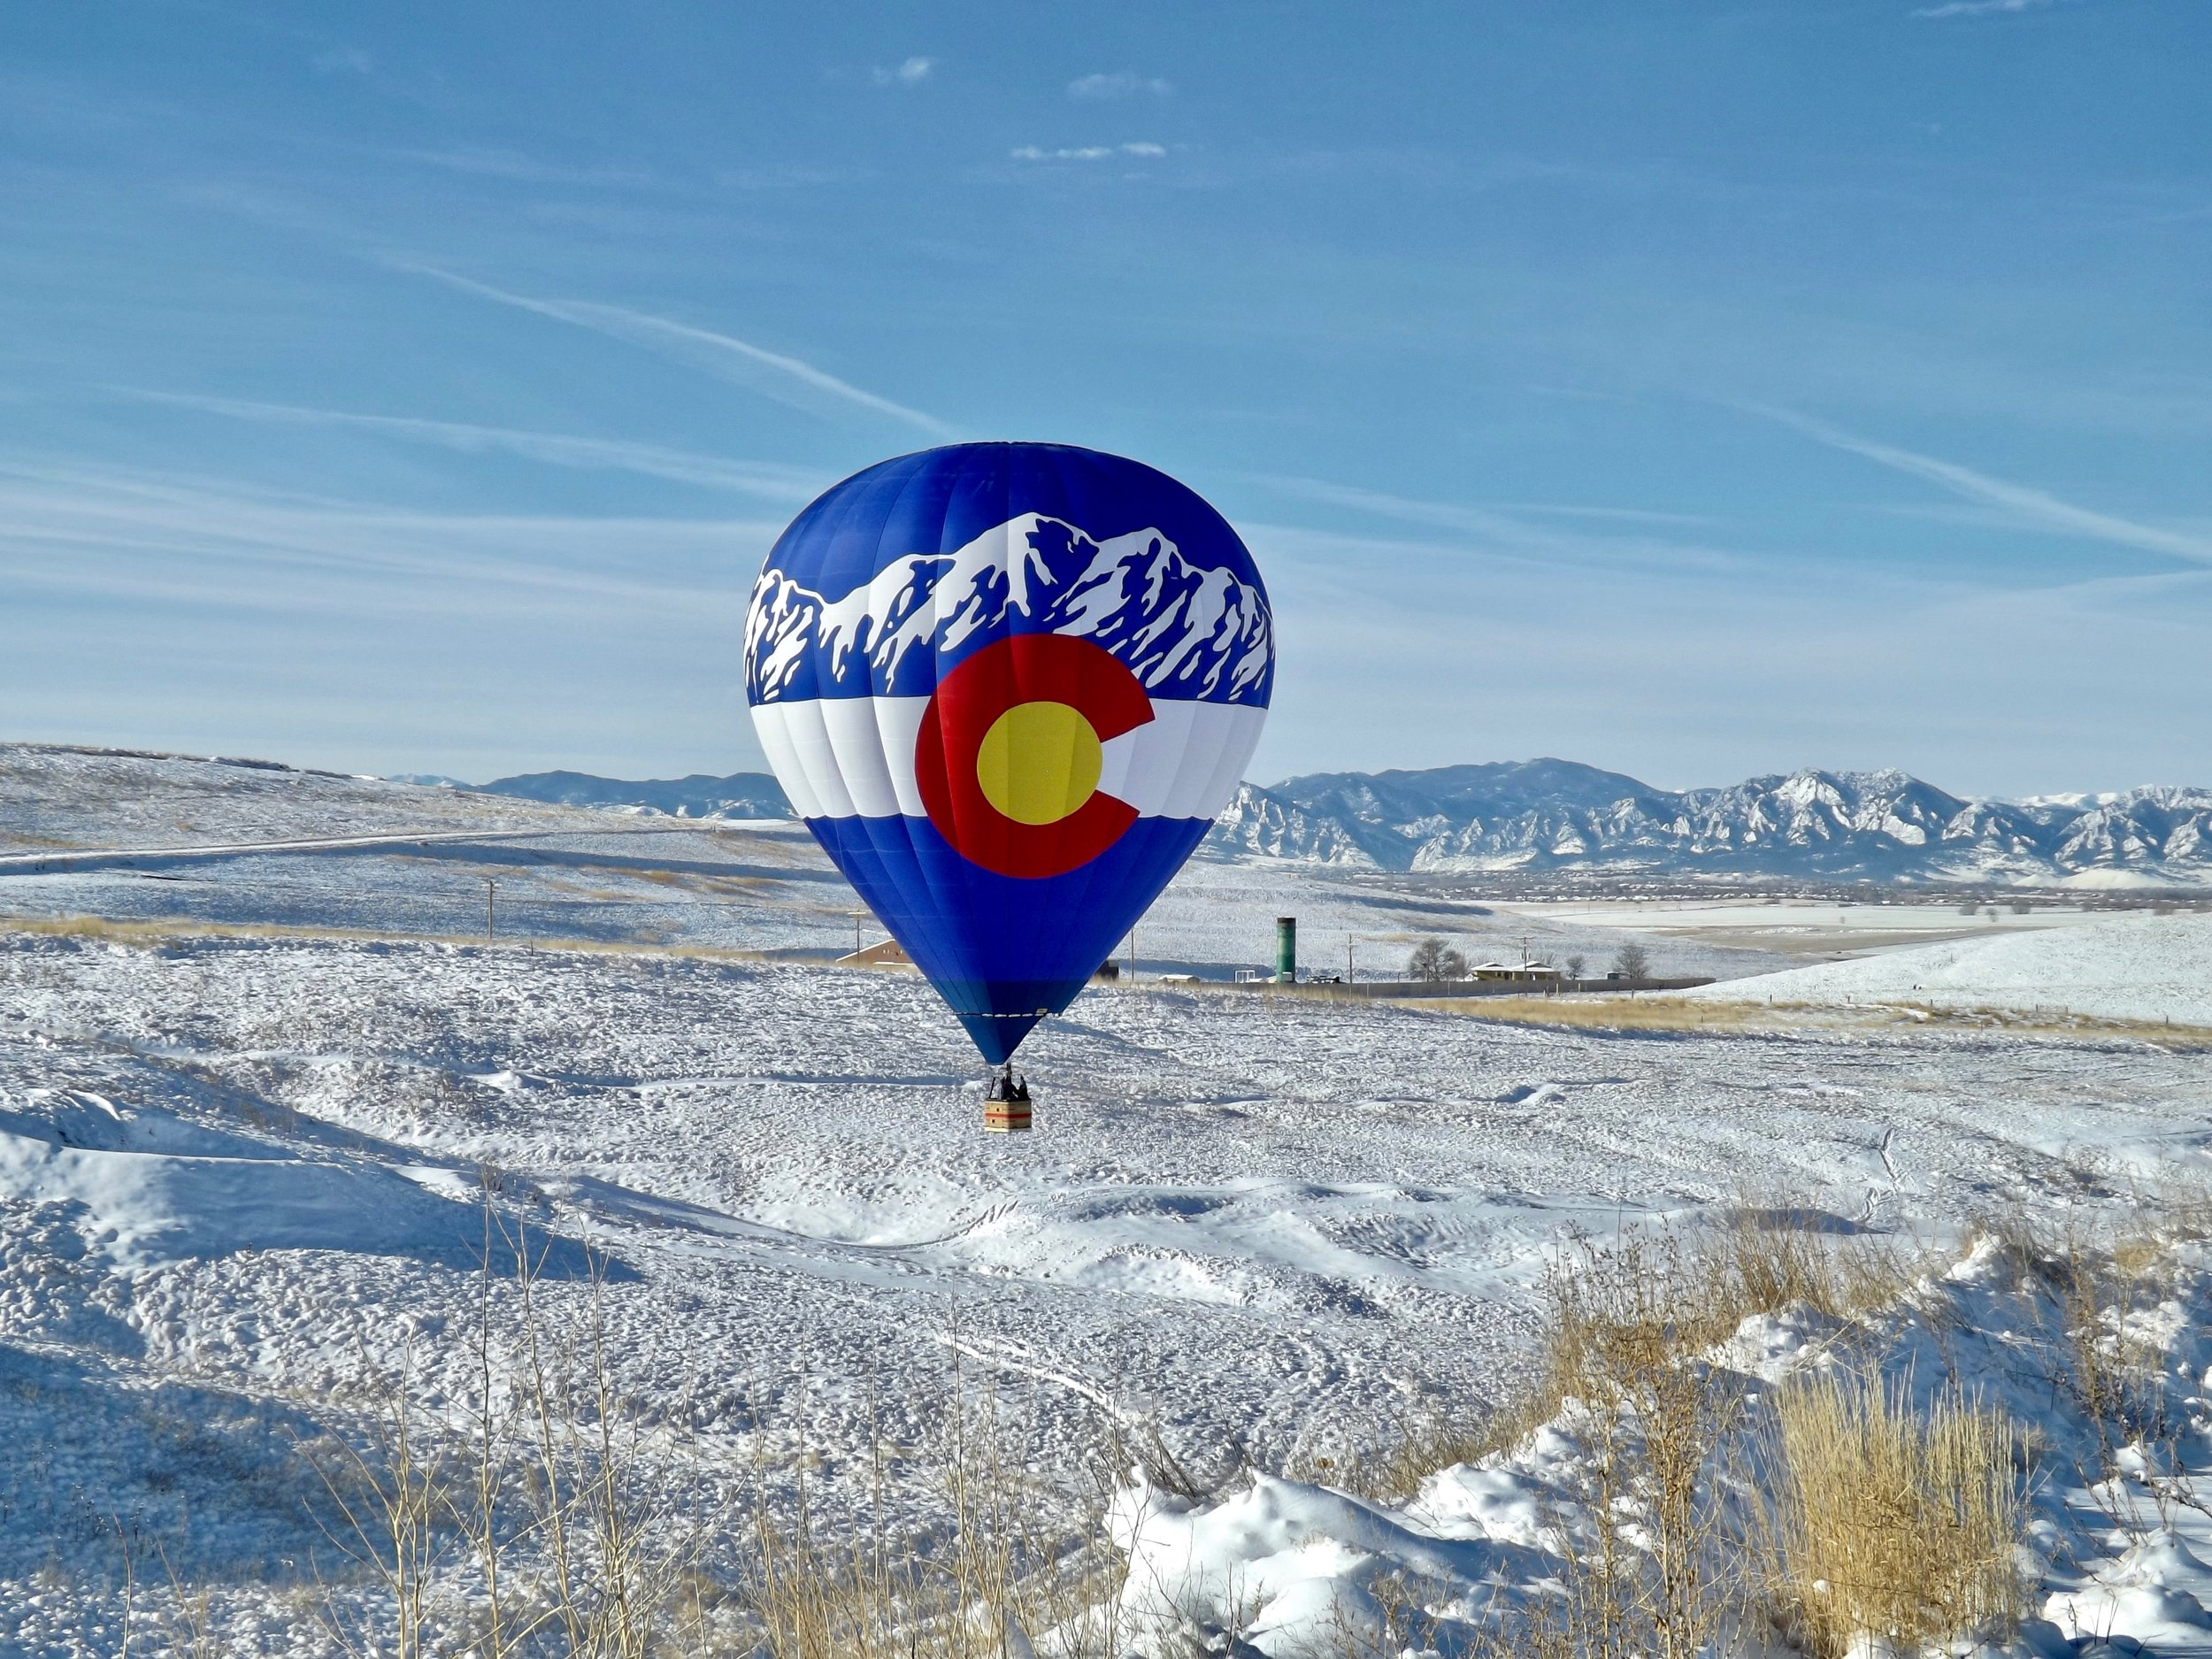 Beautiful WInter hot air balloon flight!